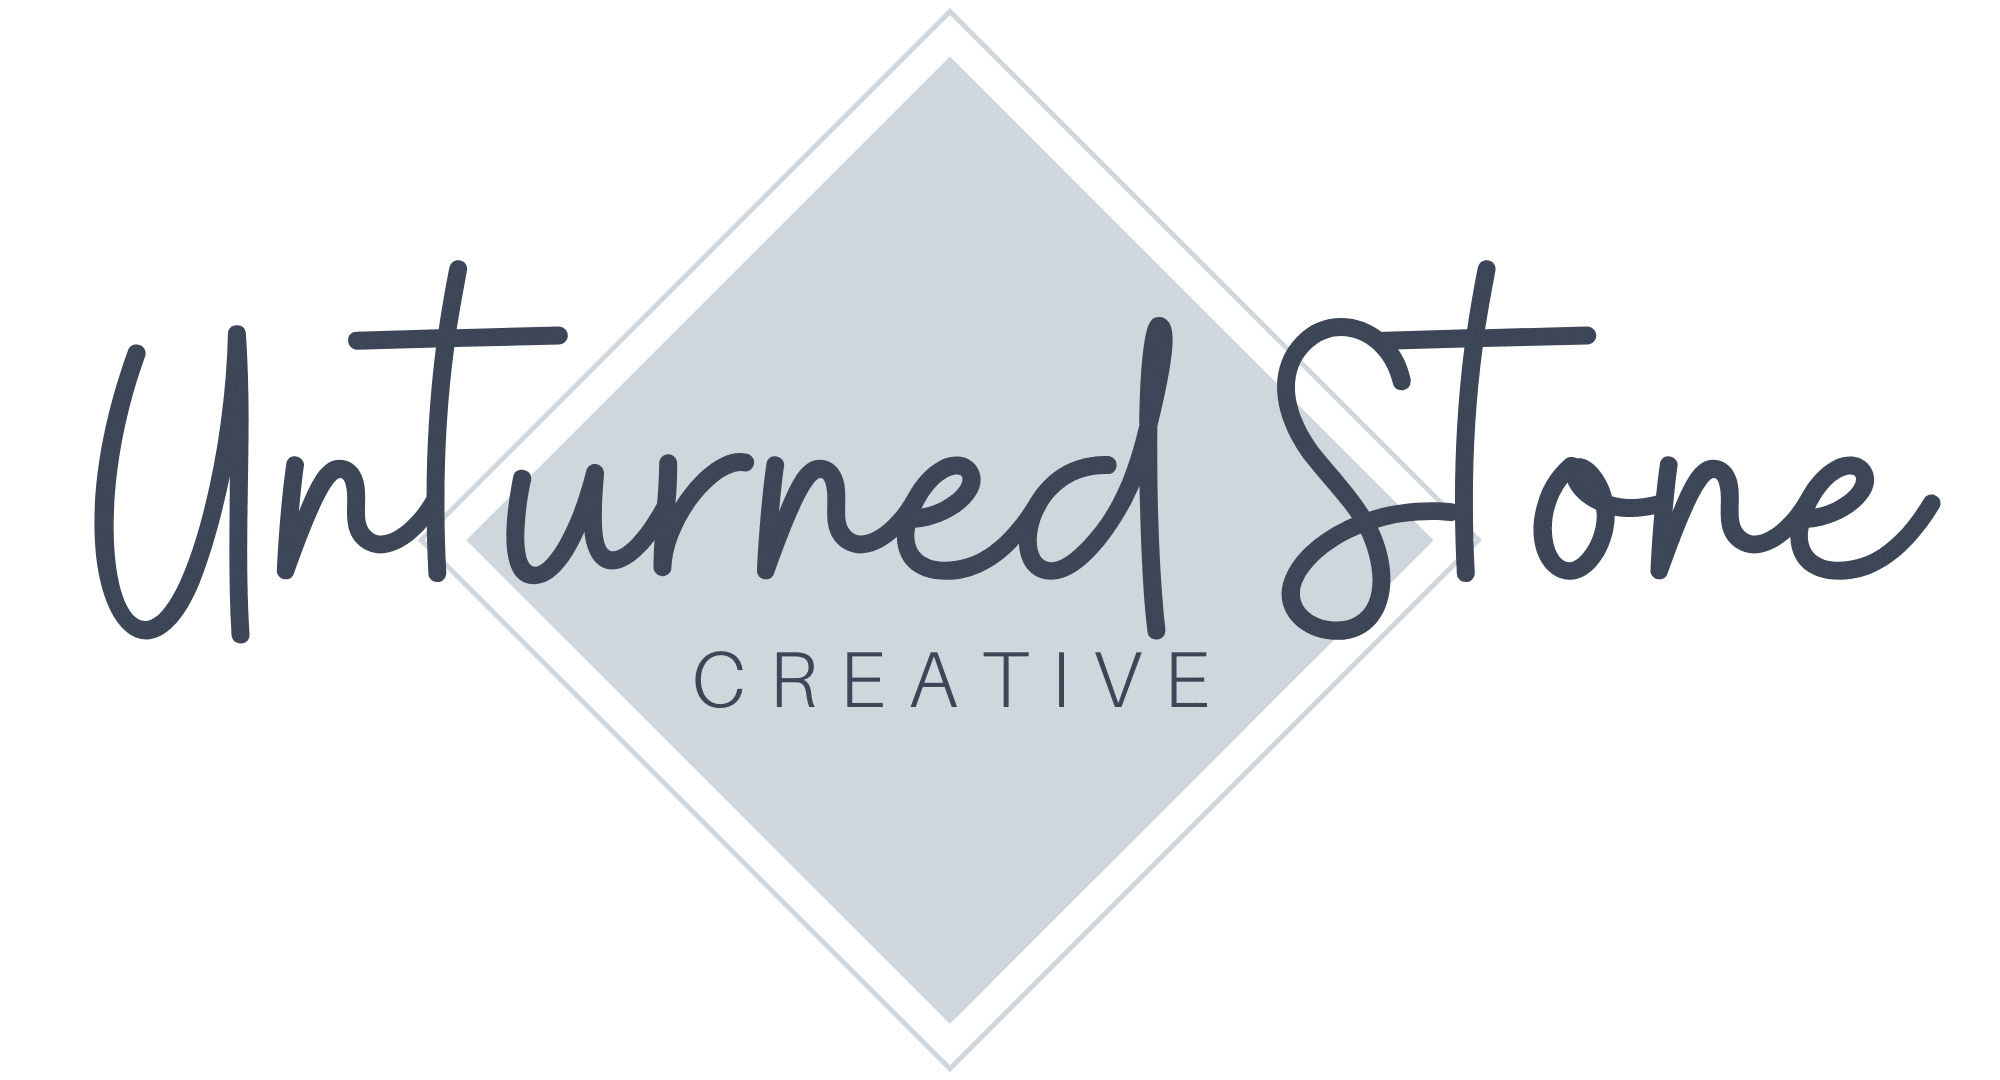 Unturned Stone Creative